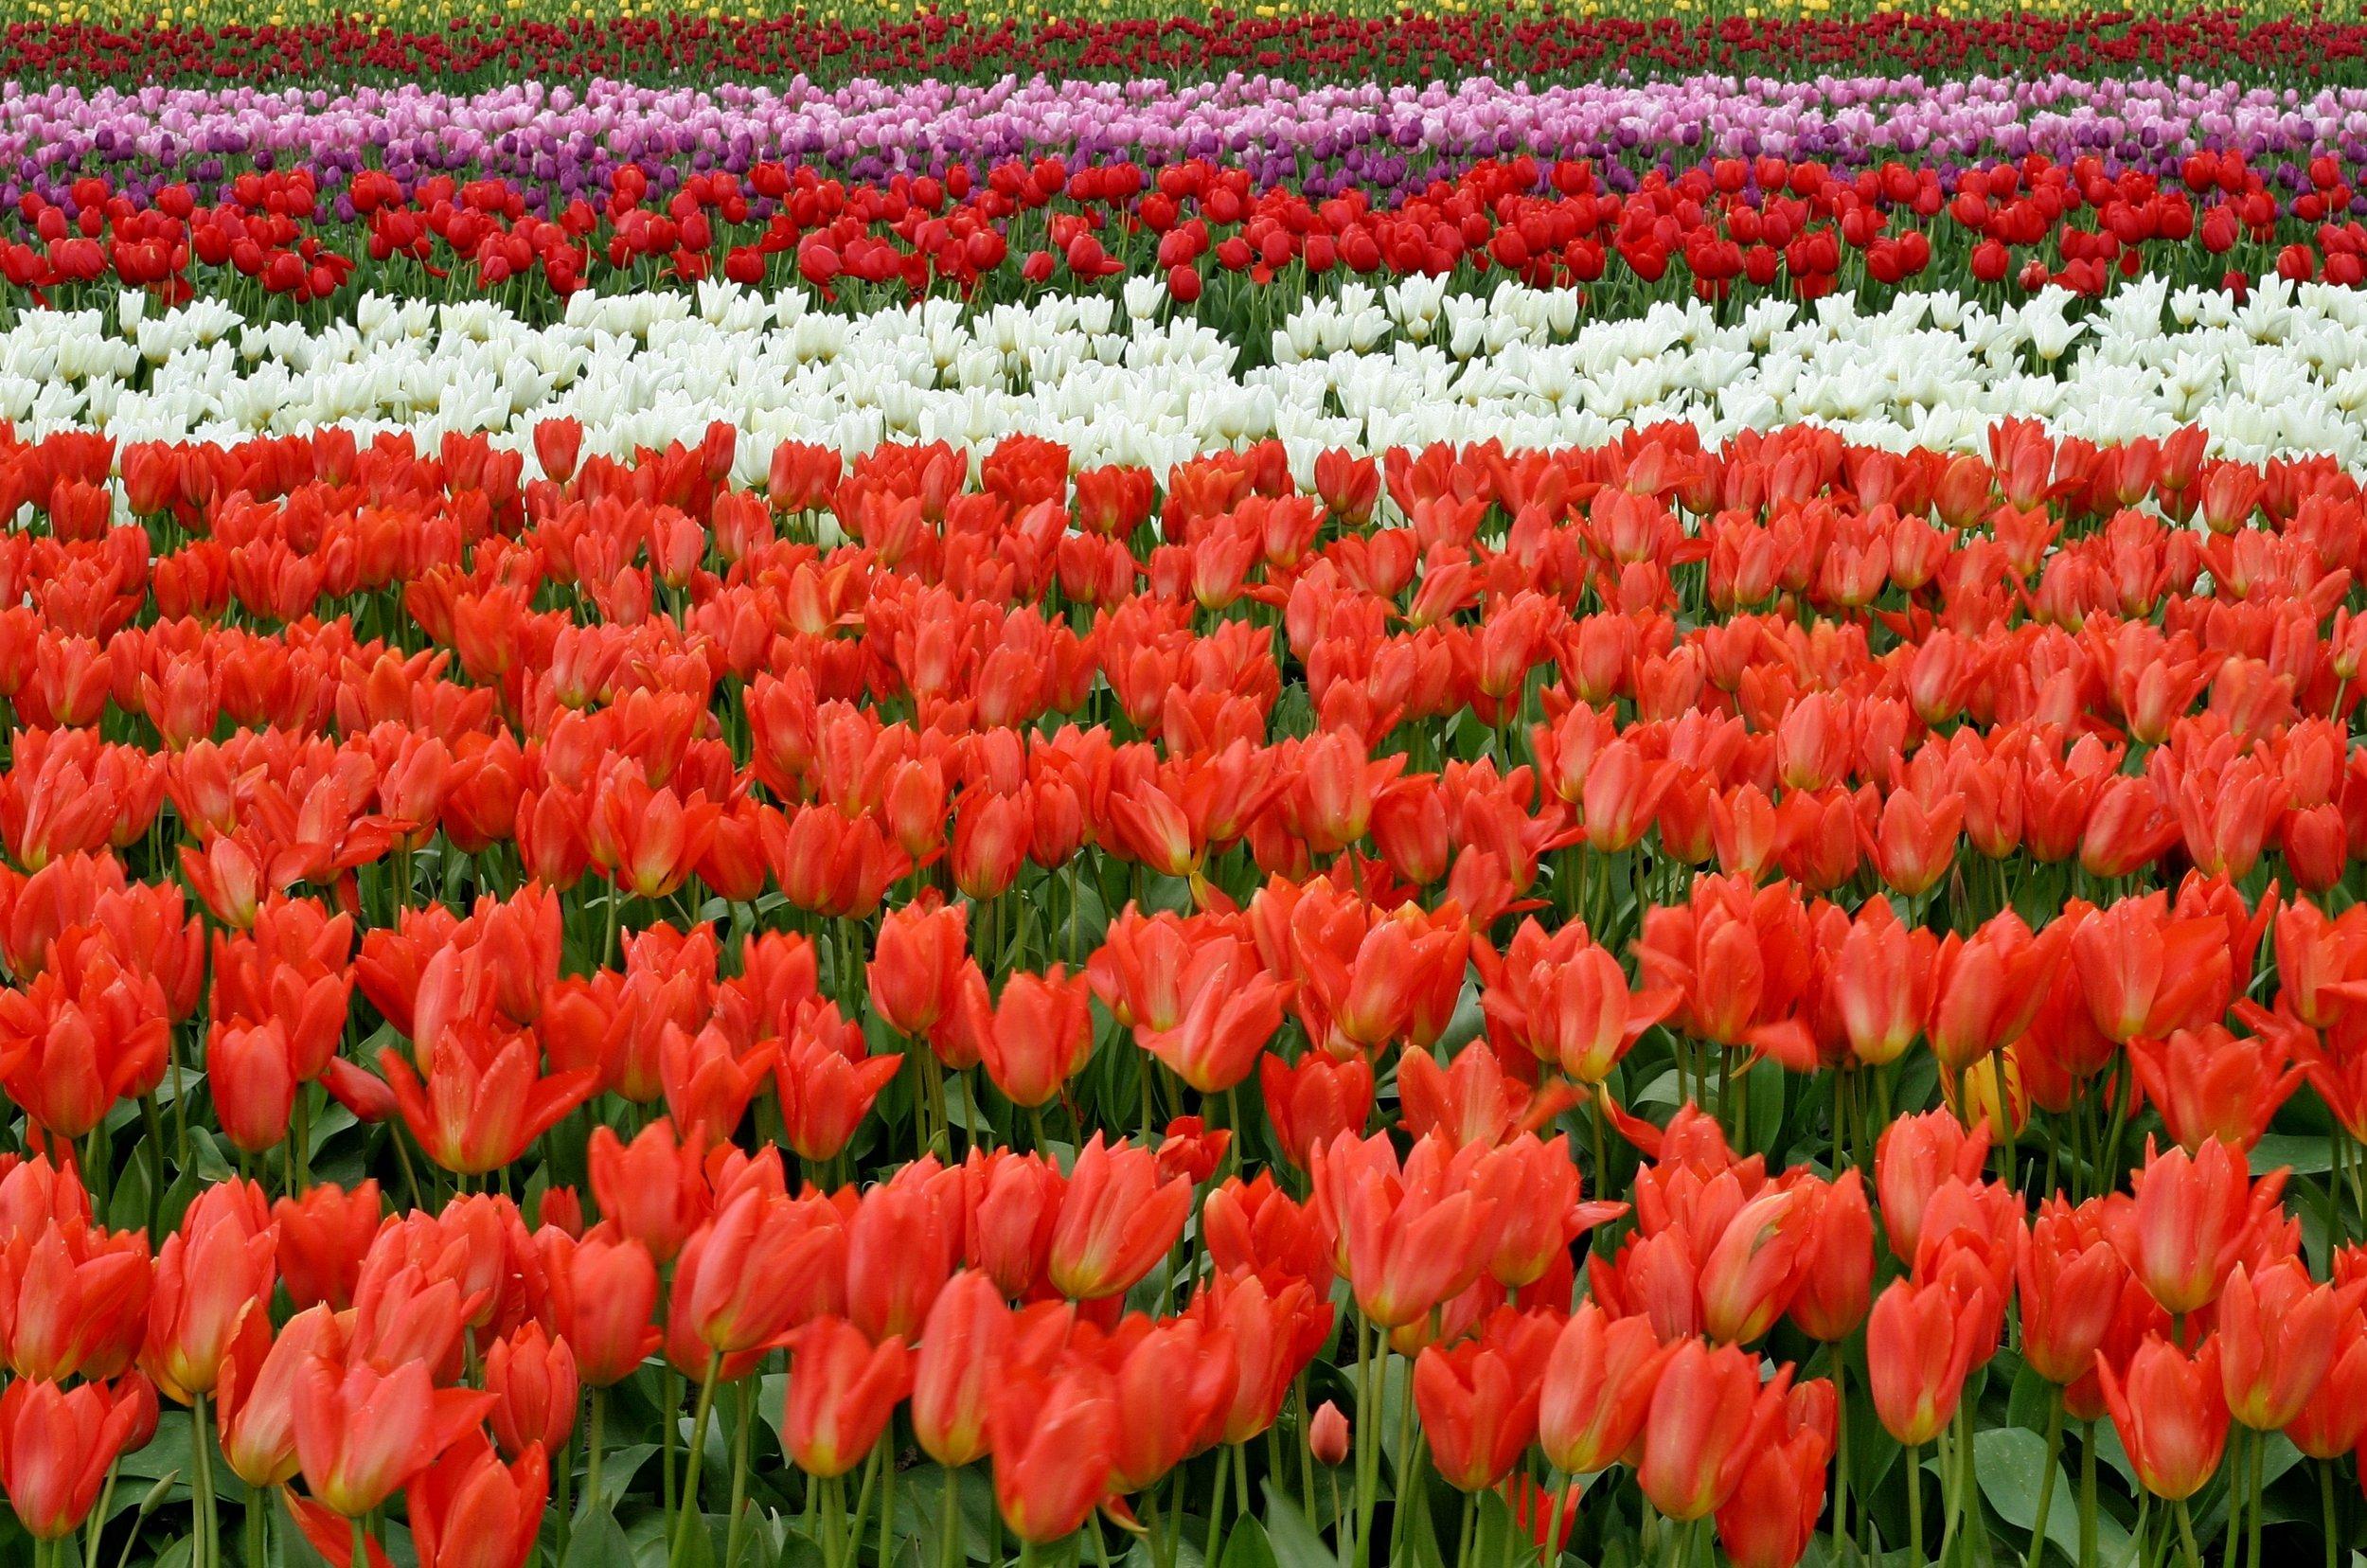 lips-flowers-fish-eye-red-66902.jpeg